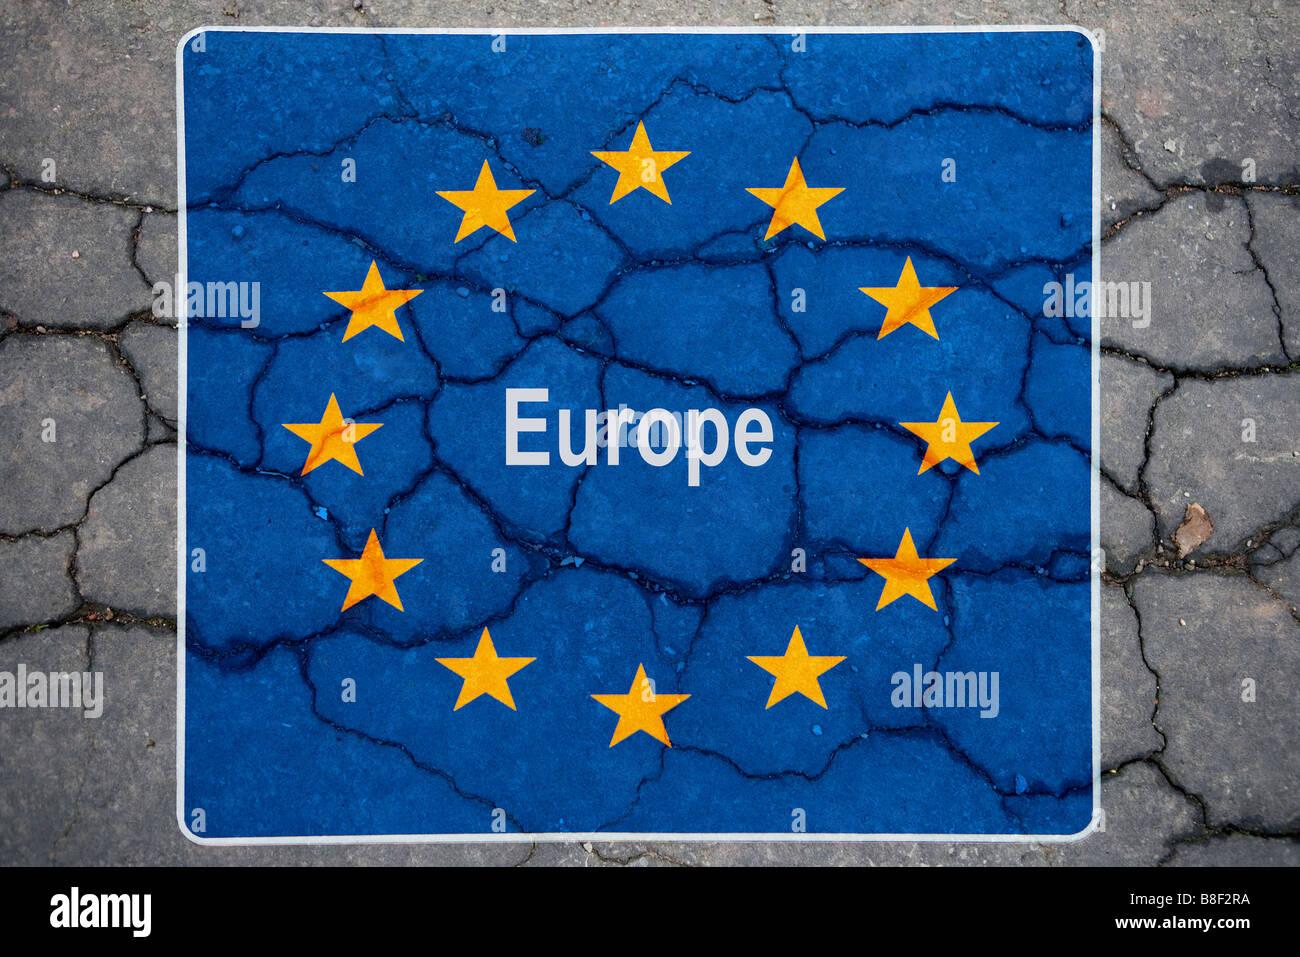 symbolic representation of the credit crisis symbolische Darstellung der Bankenkrise - Stock Image